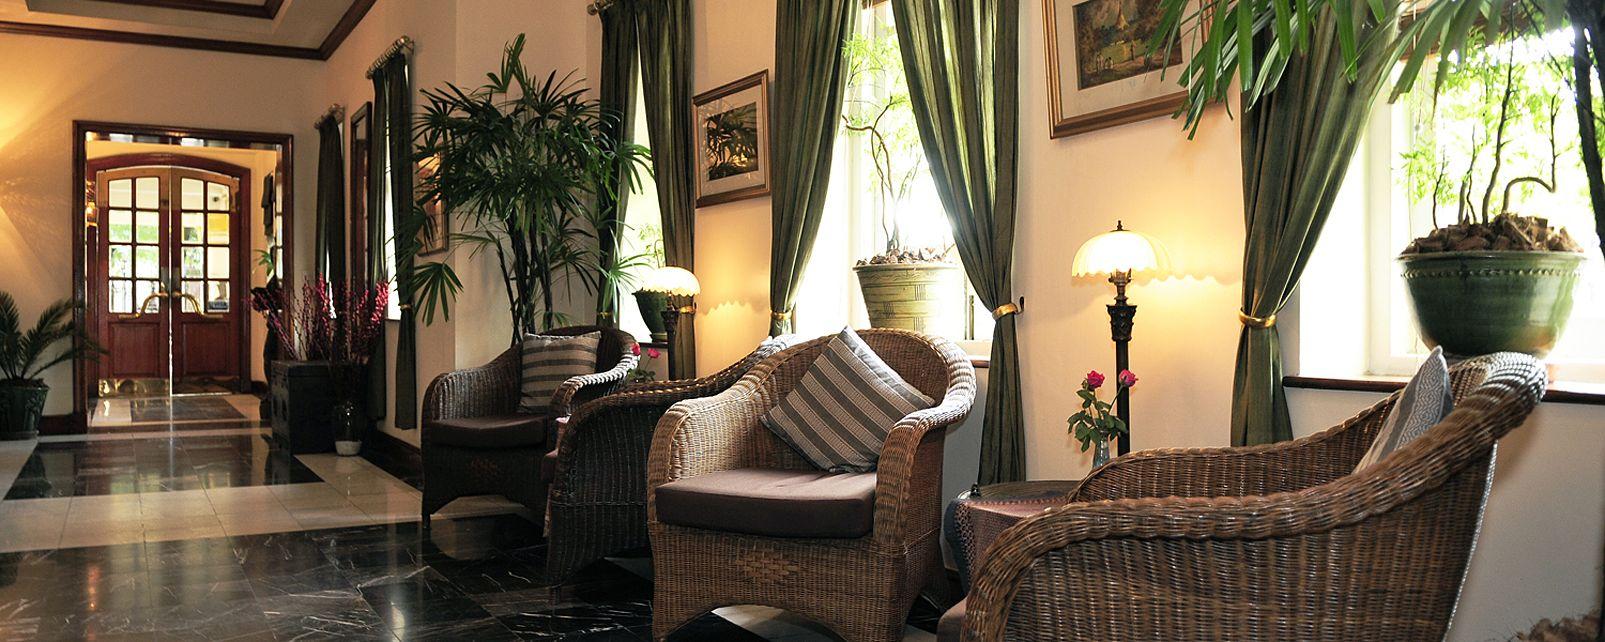 Hôtel Savoy Yangon